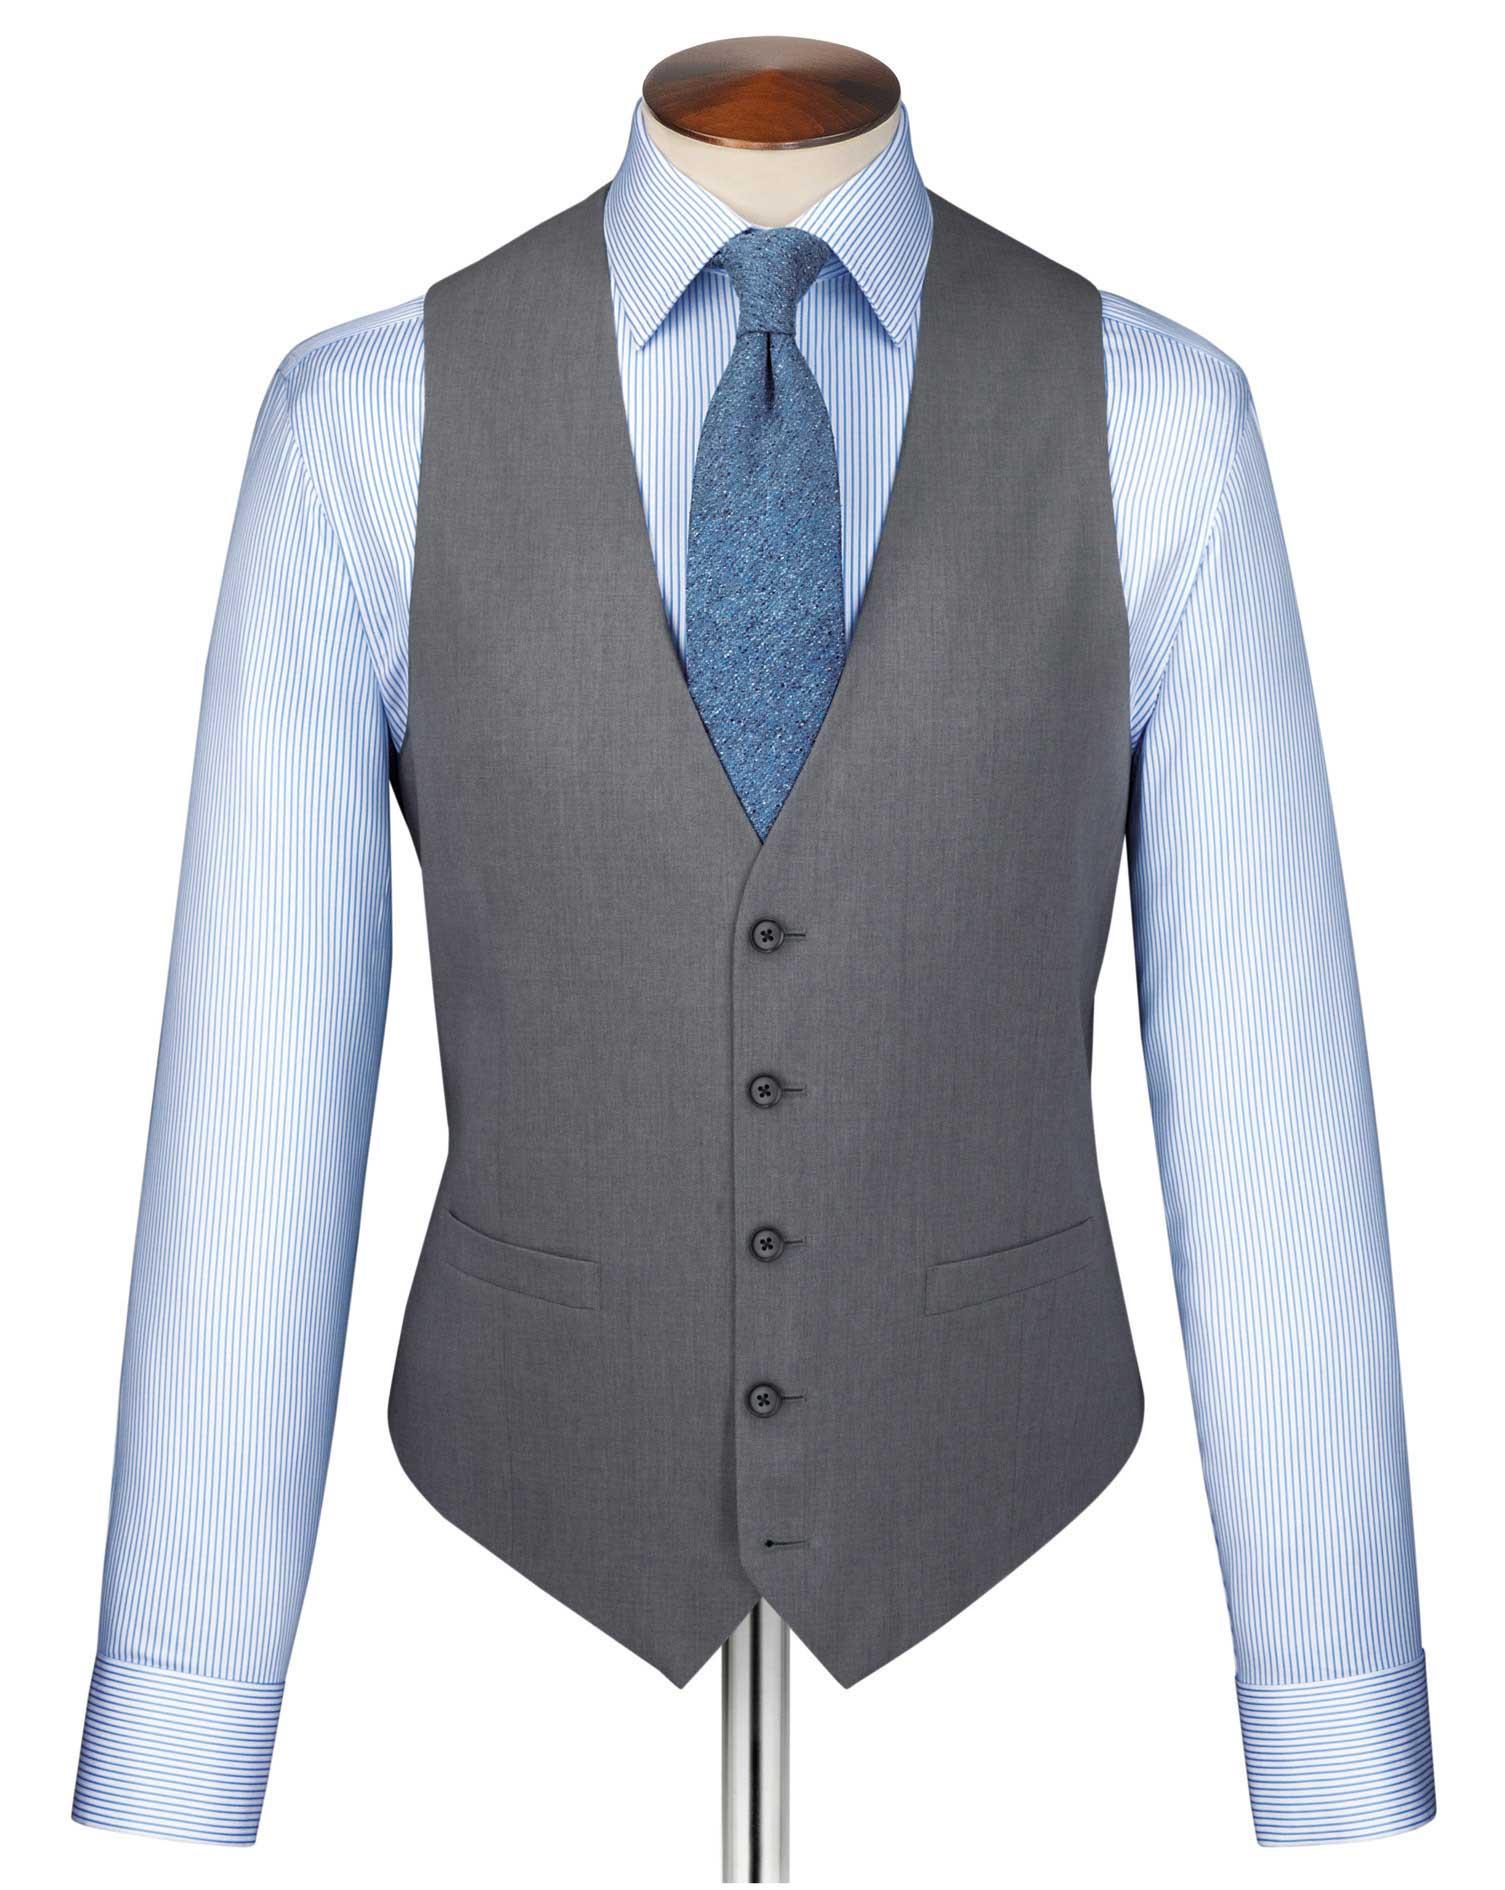 Silver Twill Business Suit Wool Waistcoat Size w36 by Charles Tyrwhitt